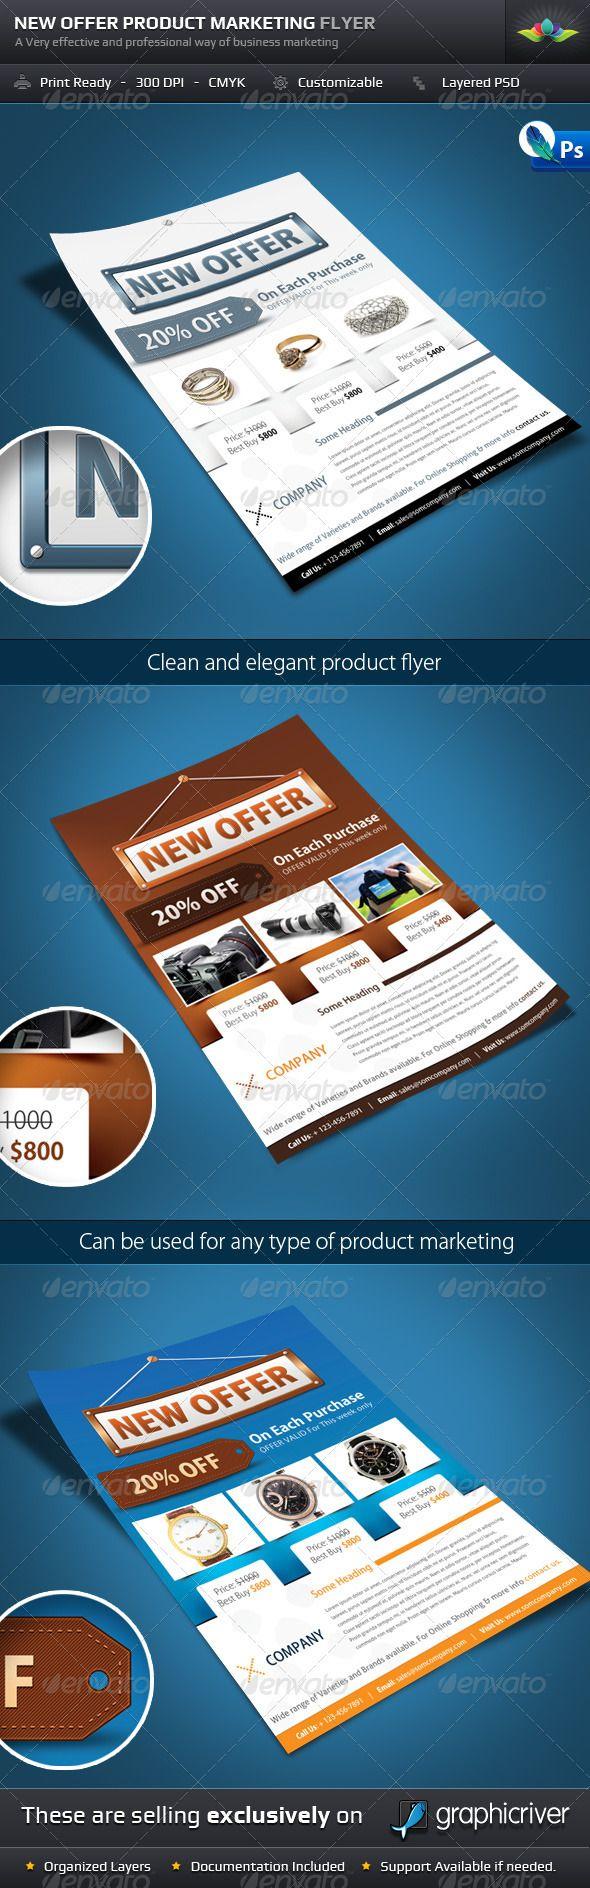 Best Marketing Flyer Images On   Marketing Flyers